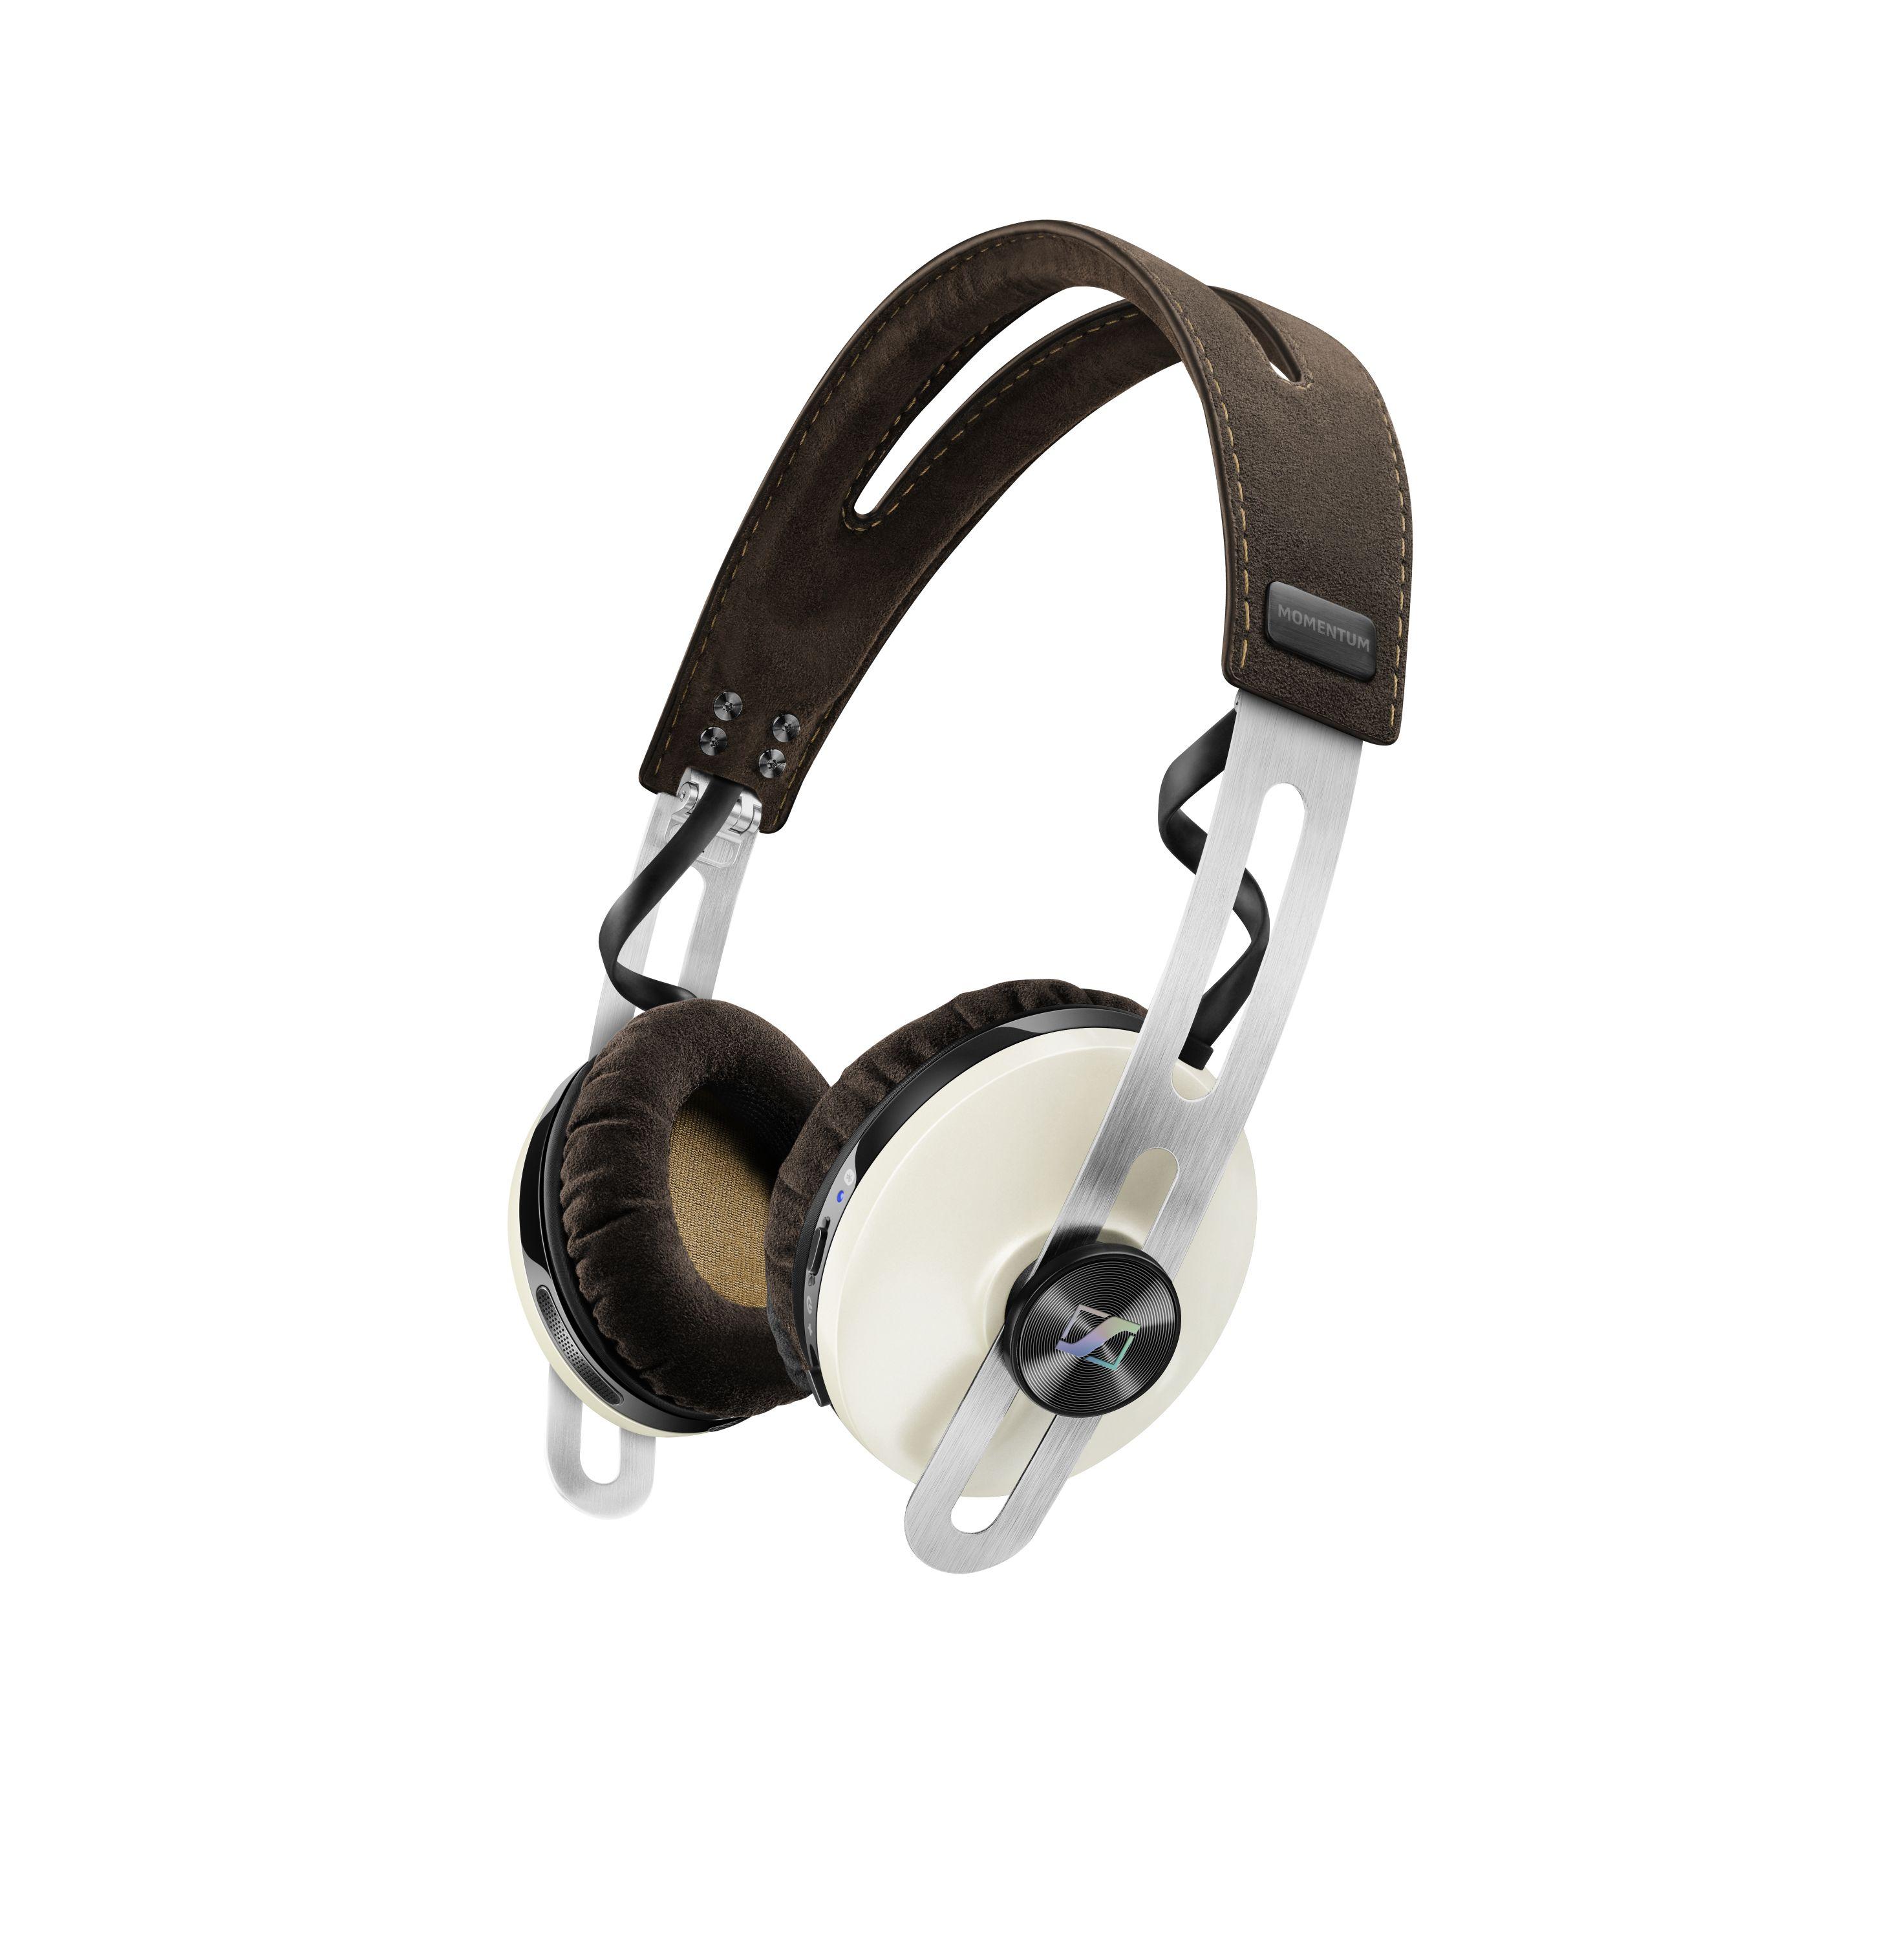 Sennheiser MOMENTUM II On-Ear Wireless